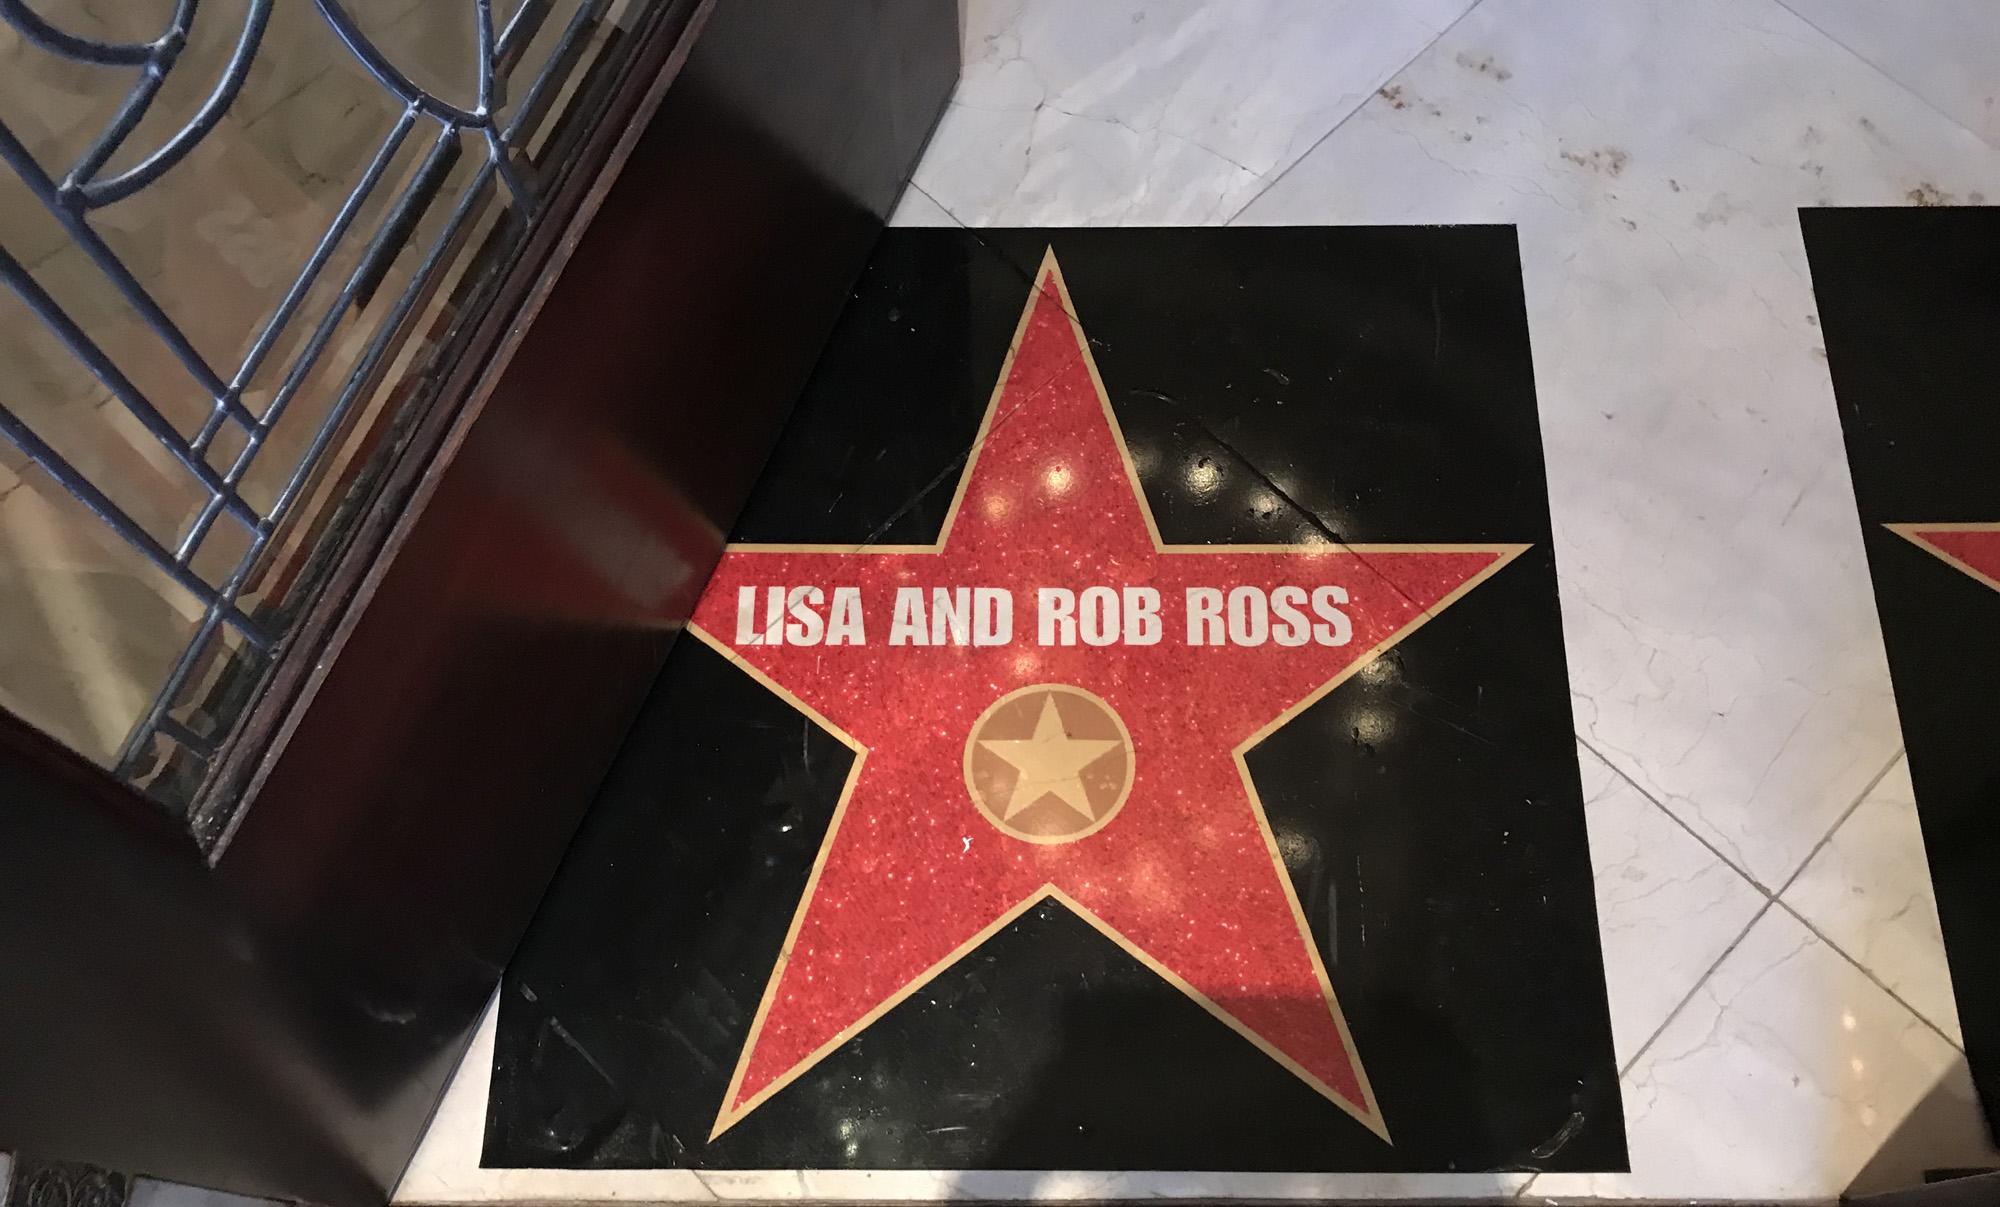 Ross_Premiere_Star_2000x1207_IMG_7913.jpg